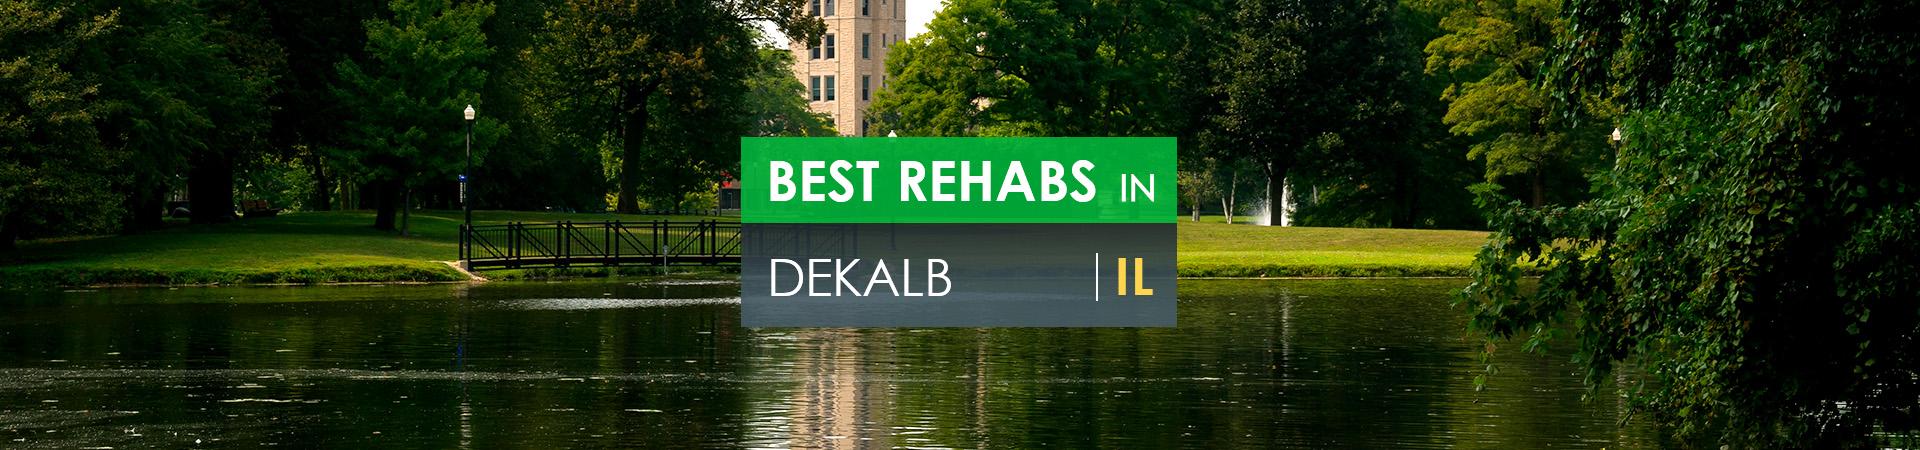 Best rehabs in Dekalb, IL